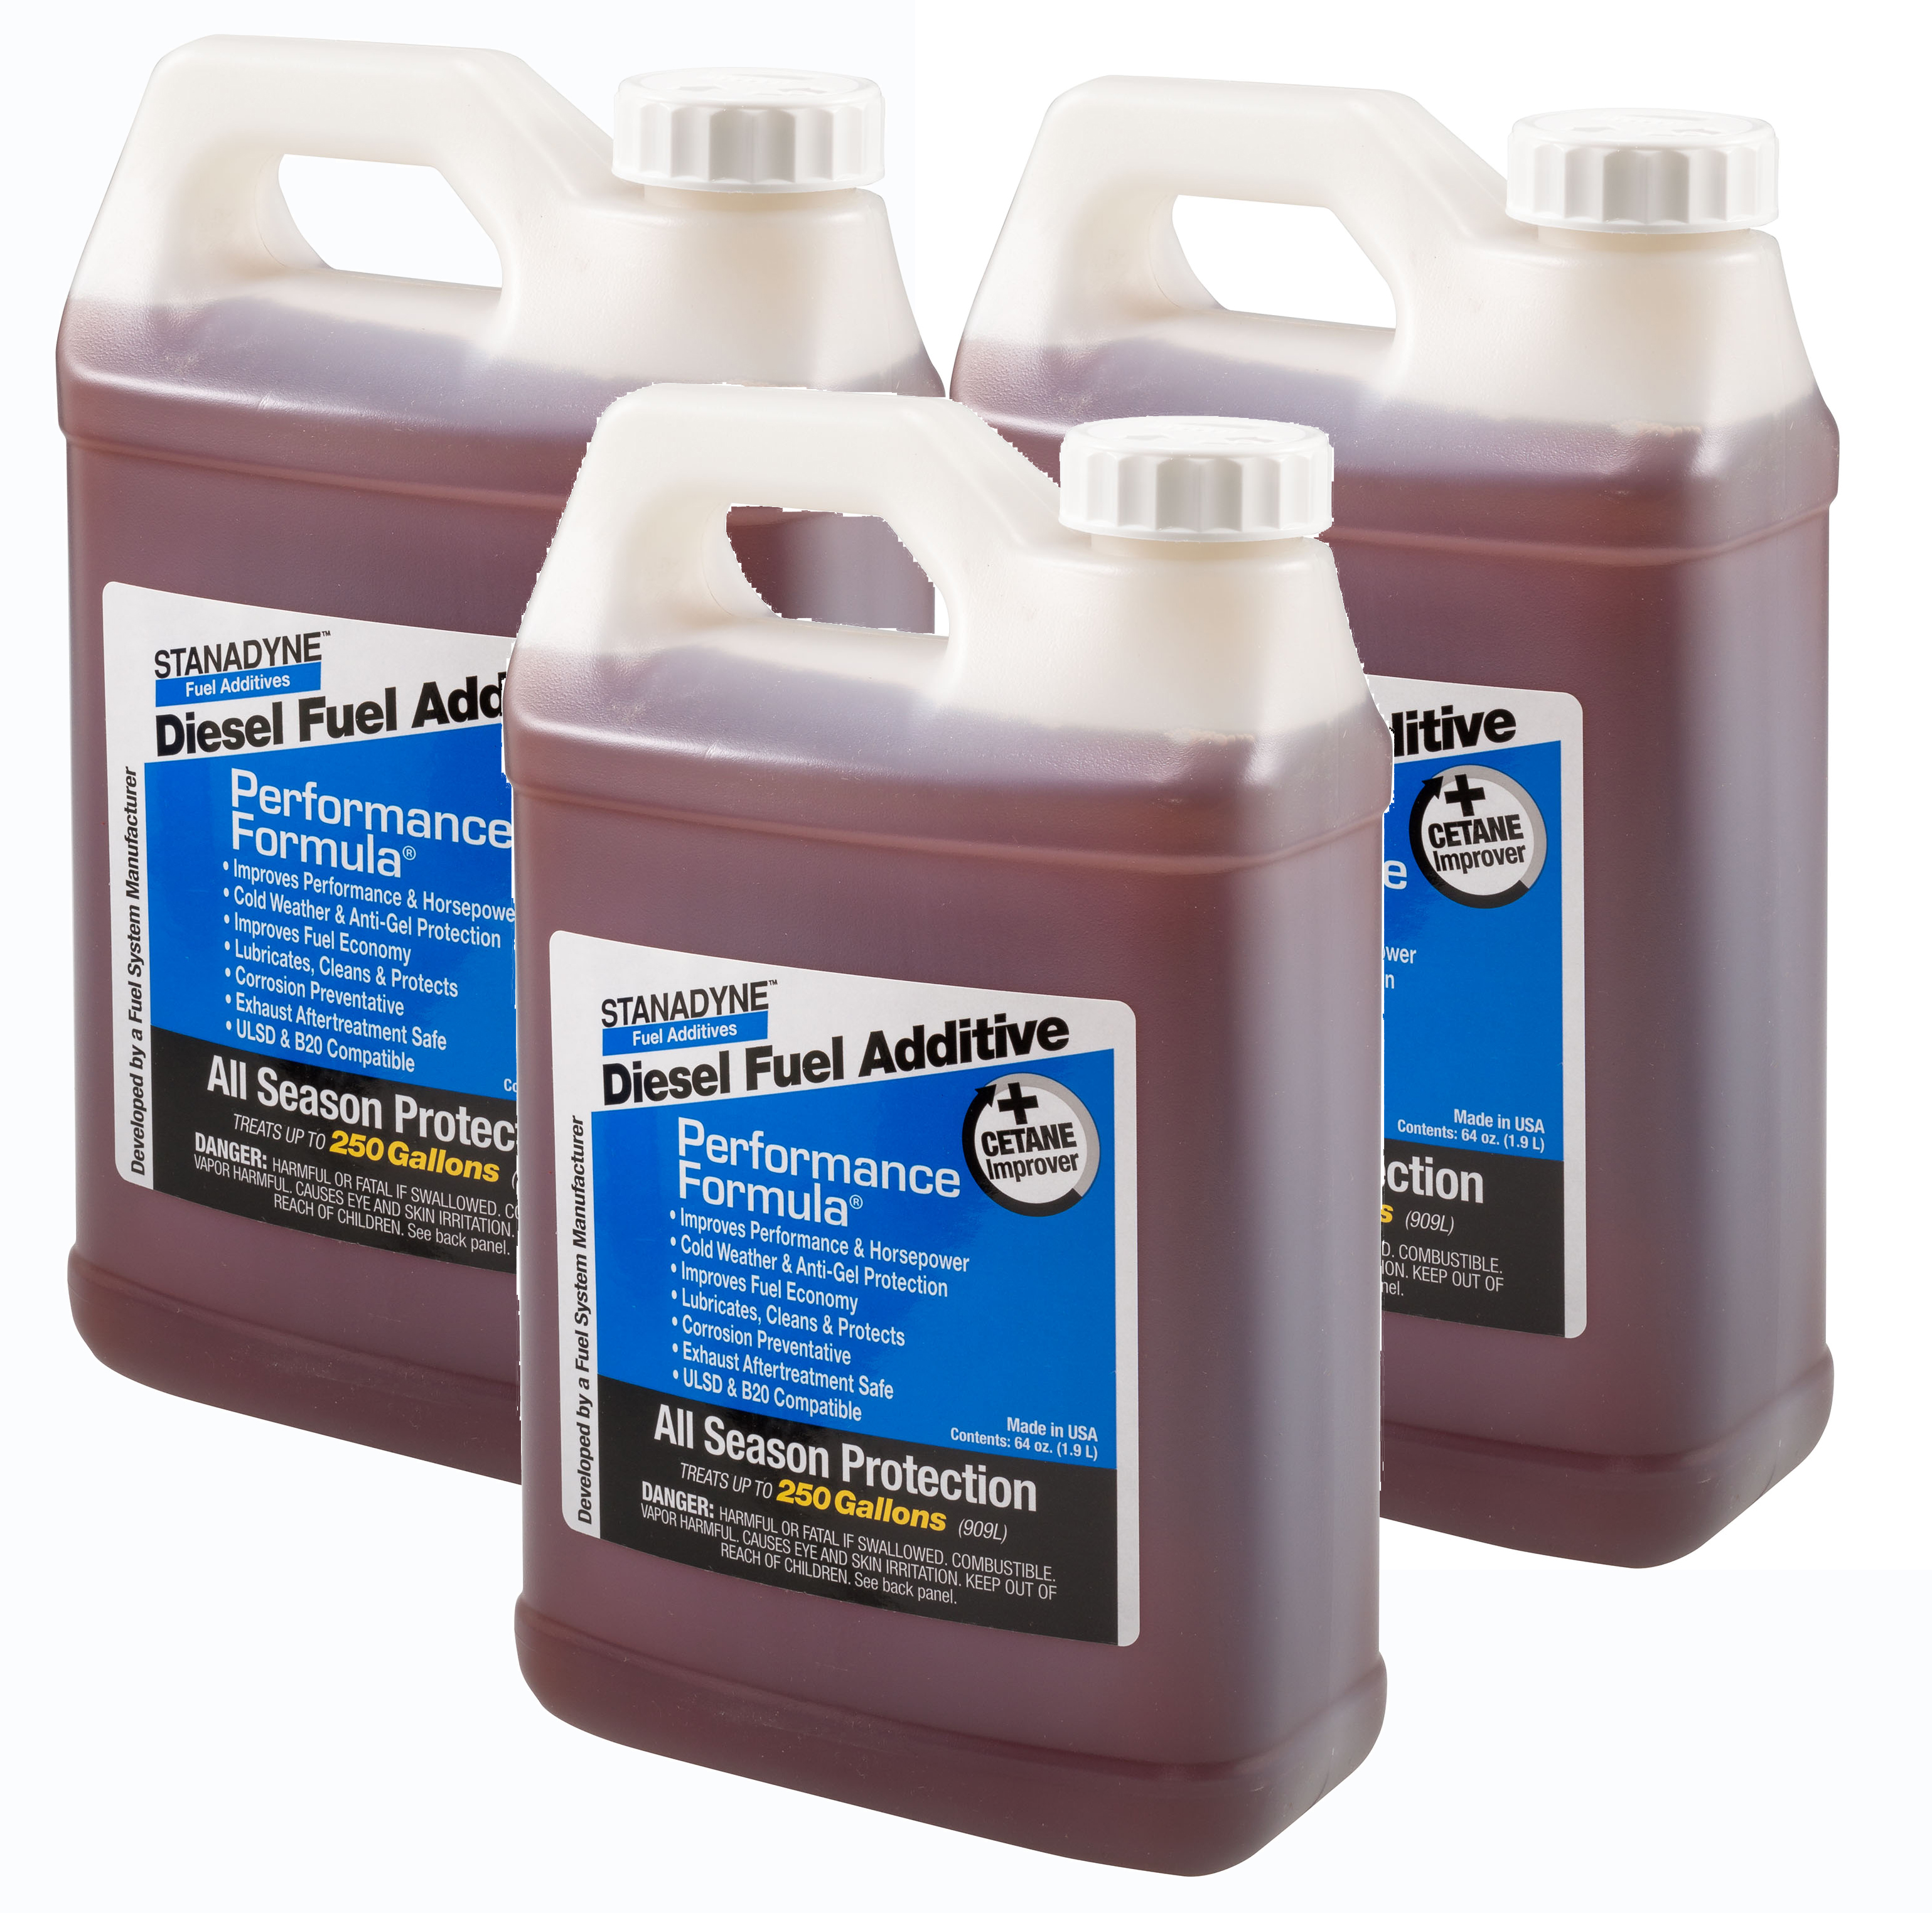 Stanadyne Performance Formula Diesel Fuel Additive  | 3 Pack of  1/2 Gallon Jugs | Stanadyne # 38566